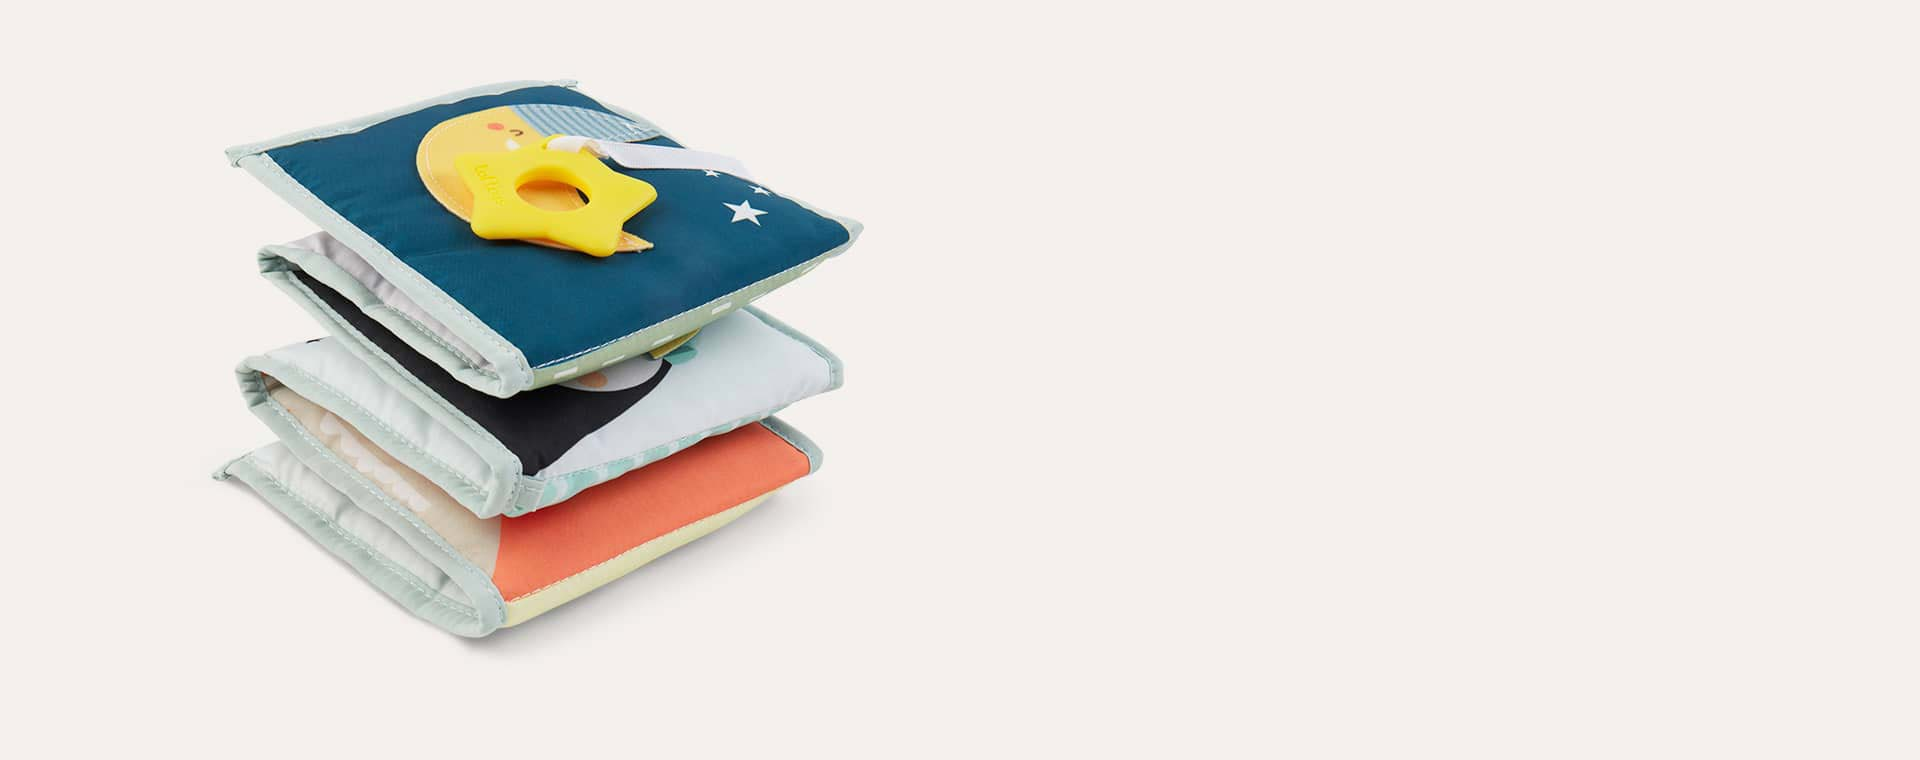 Multi taf toys North Pole Activity Book